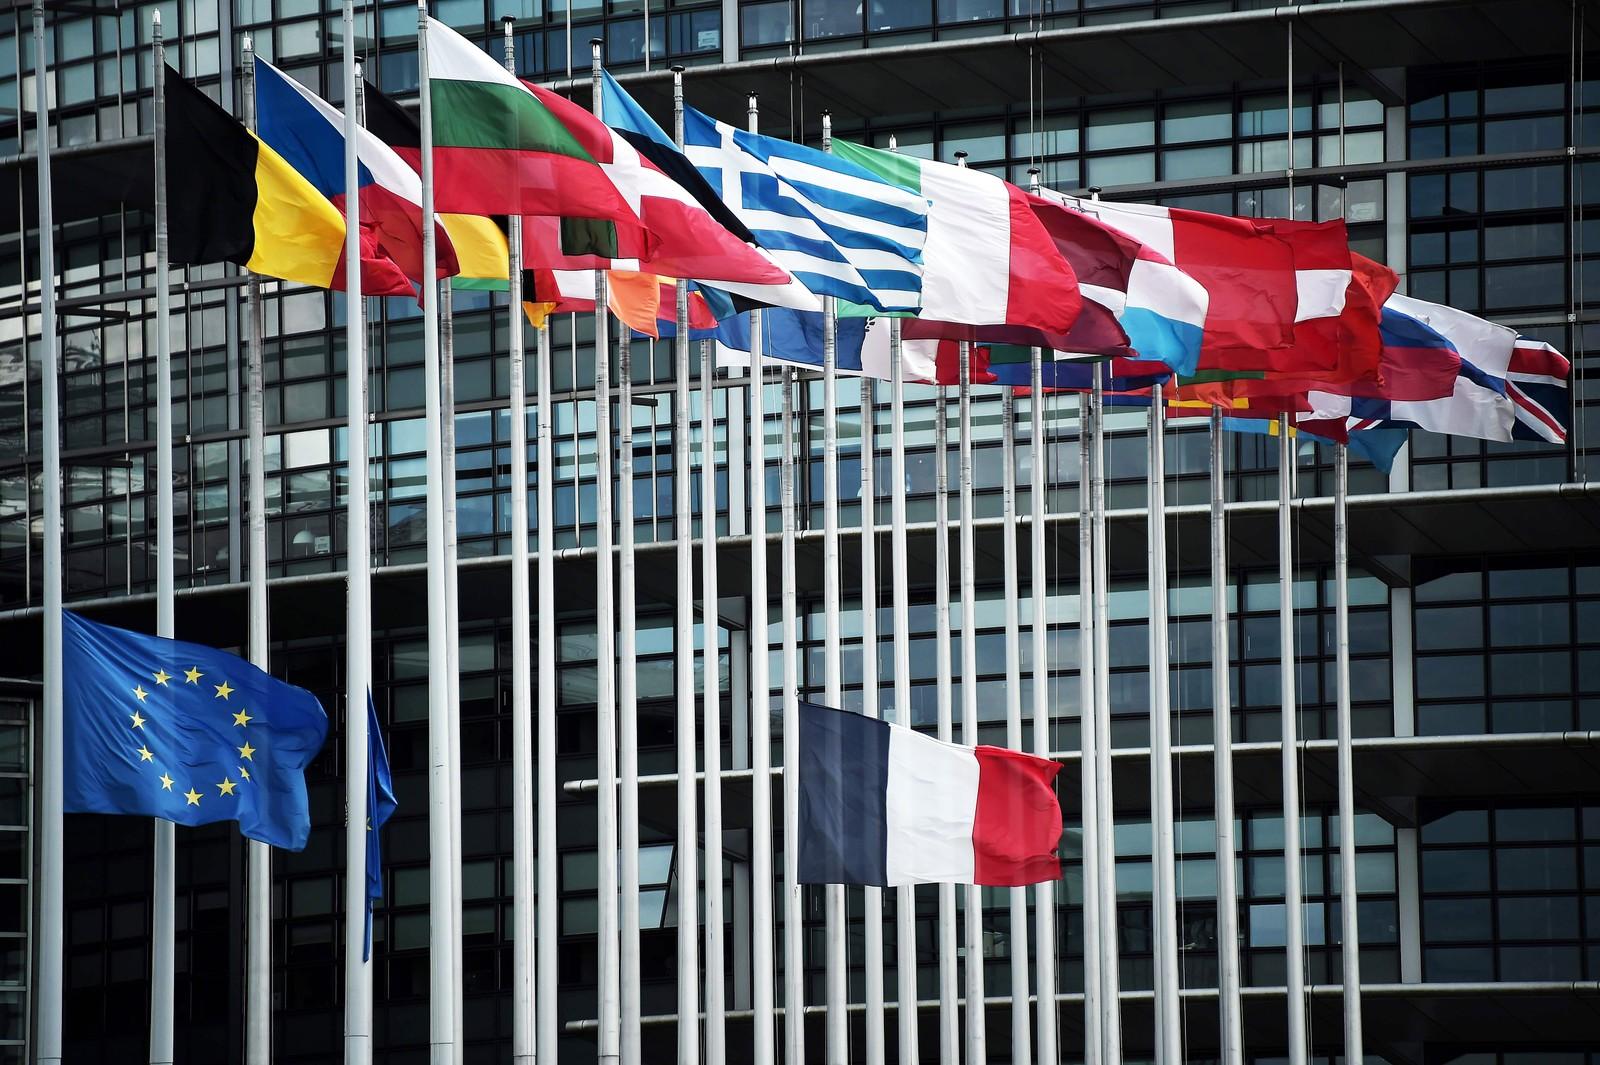 Det franske flagget på halv stang foran EU-hovedkvarteret i Strasbourg, til minne om ofrene for terroren i Nice